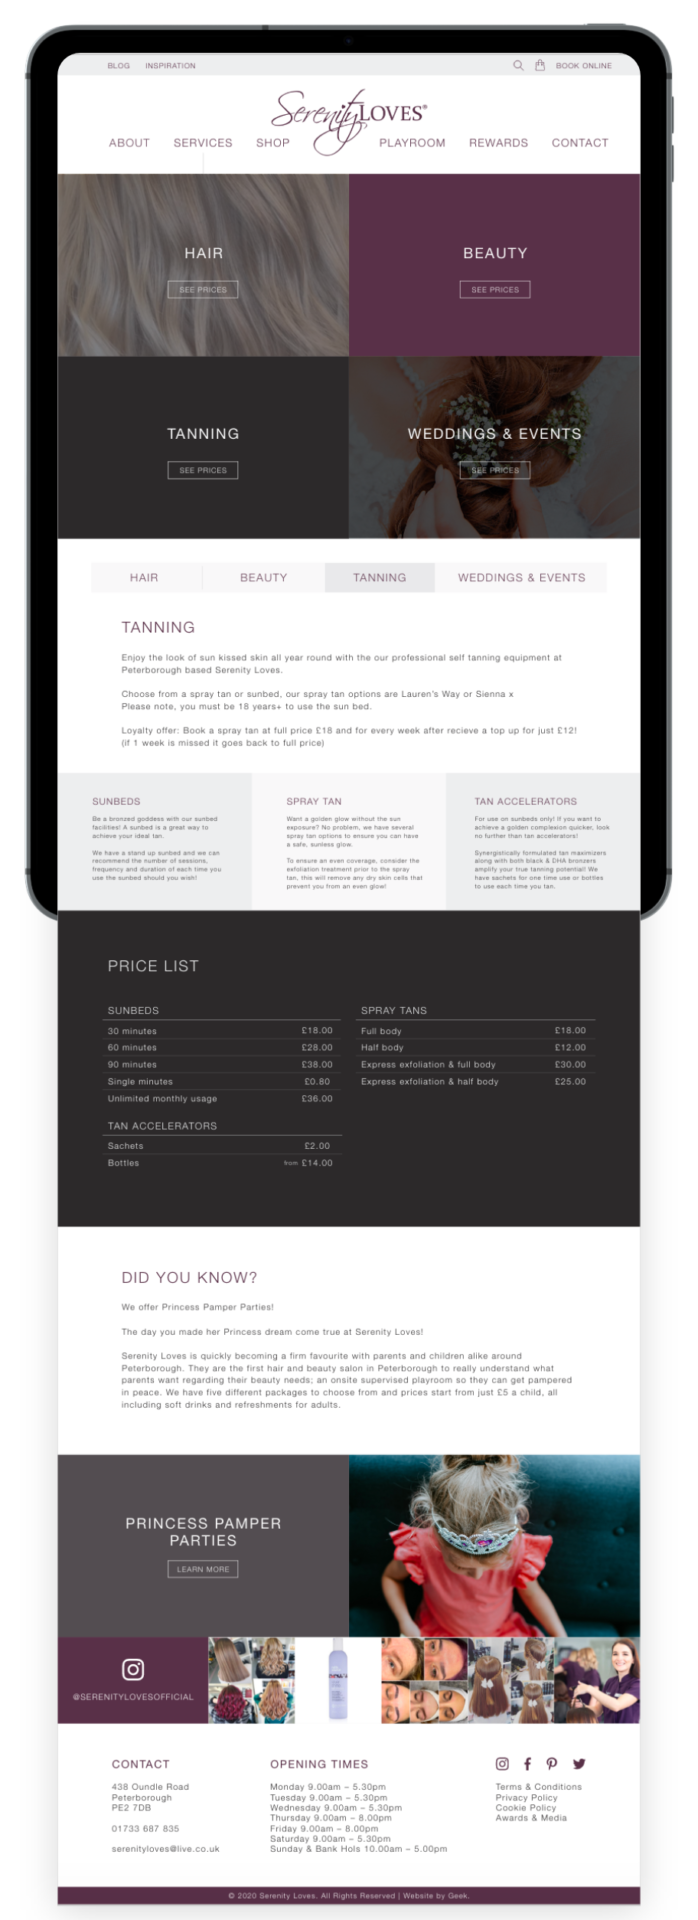 Serenity Loves website design on tablet